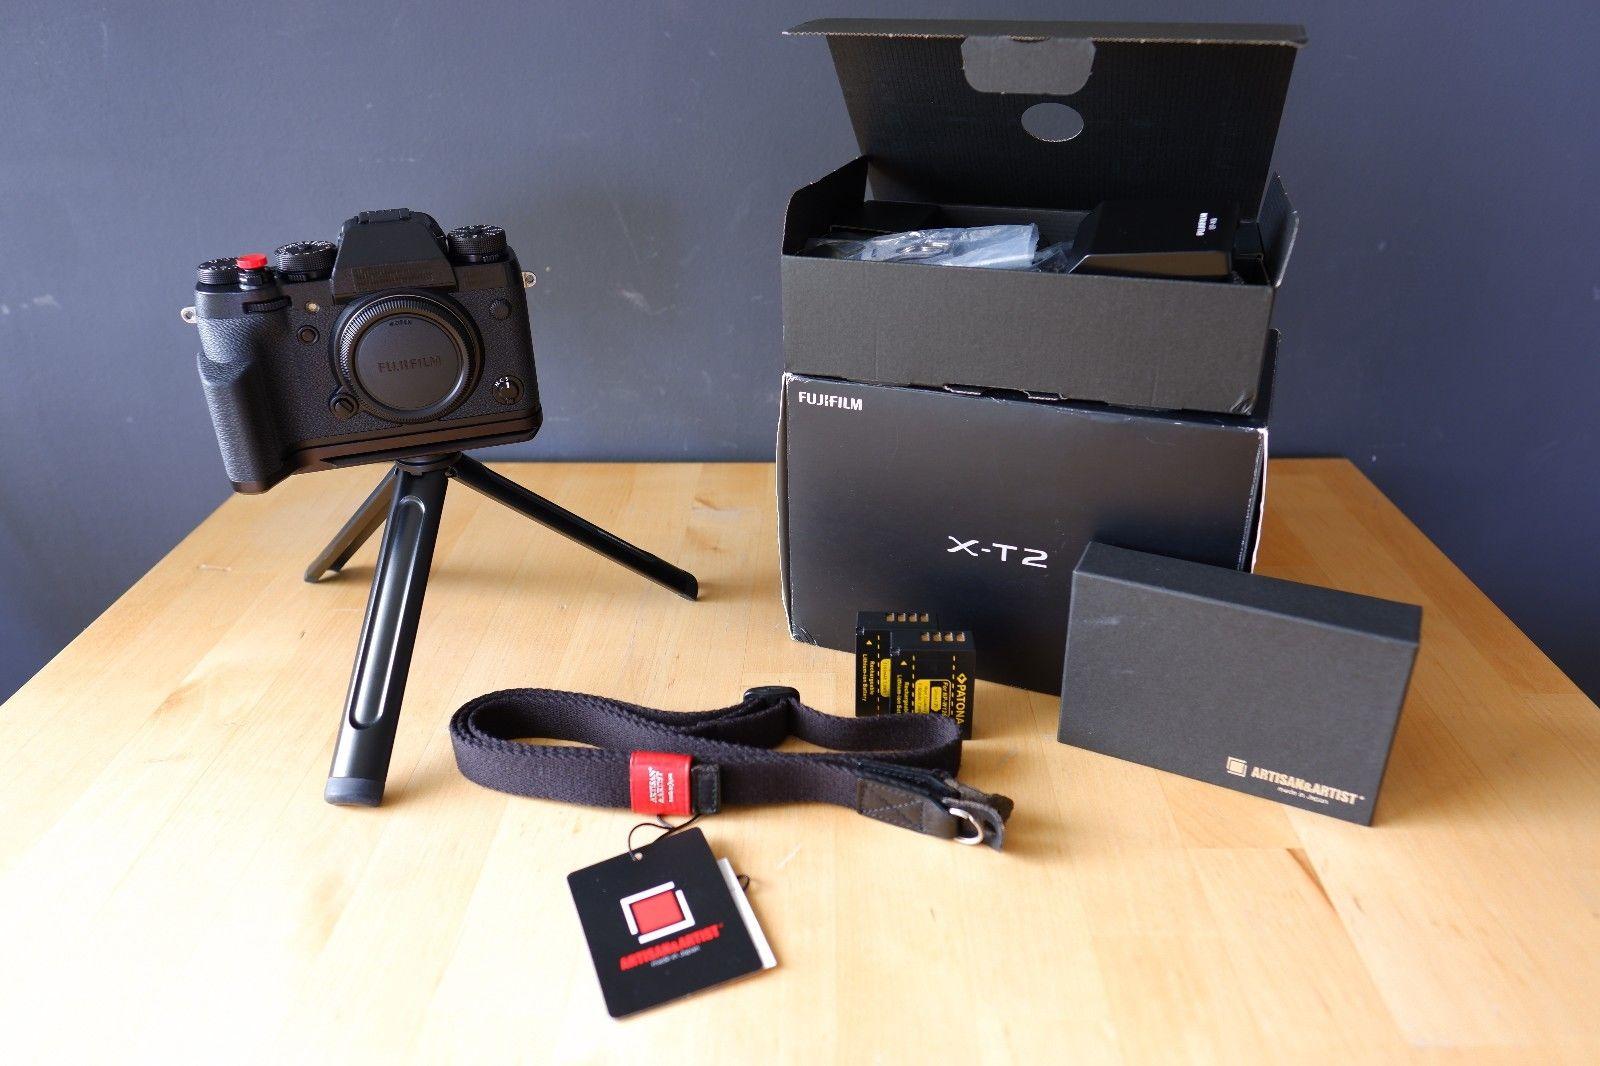 Fujifilm X-T2 Systemkamera schwarz (Body + Zubehörpaket)